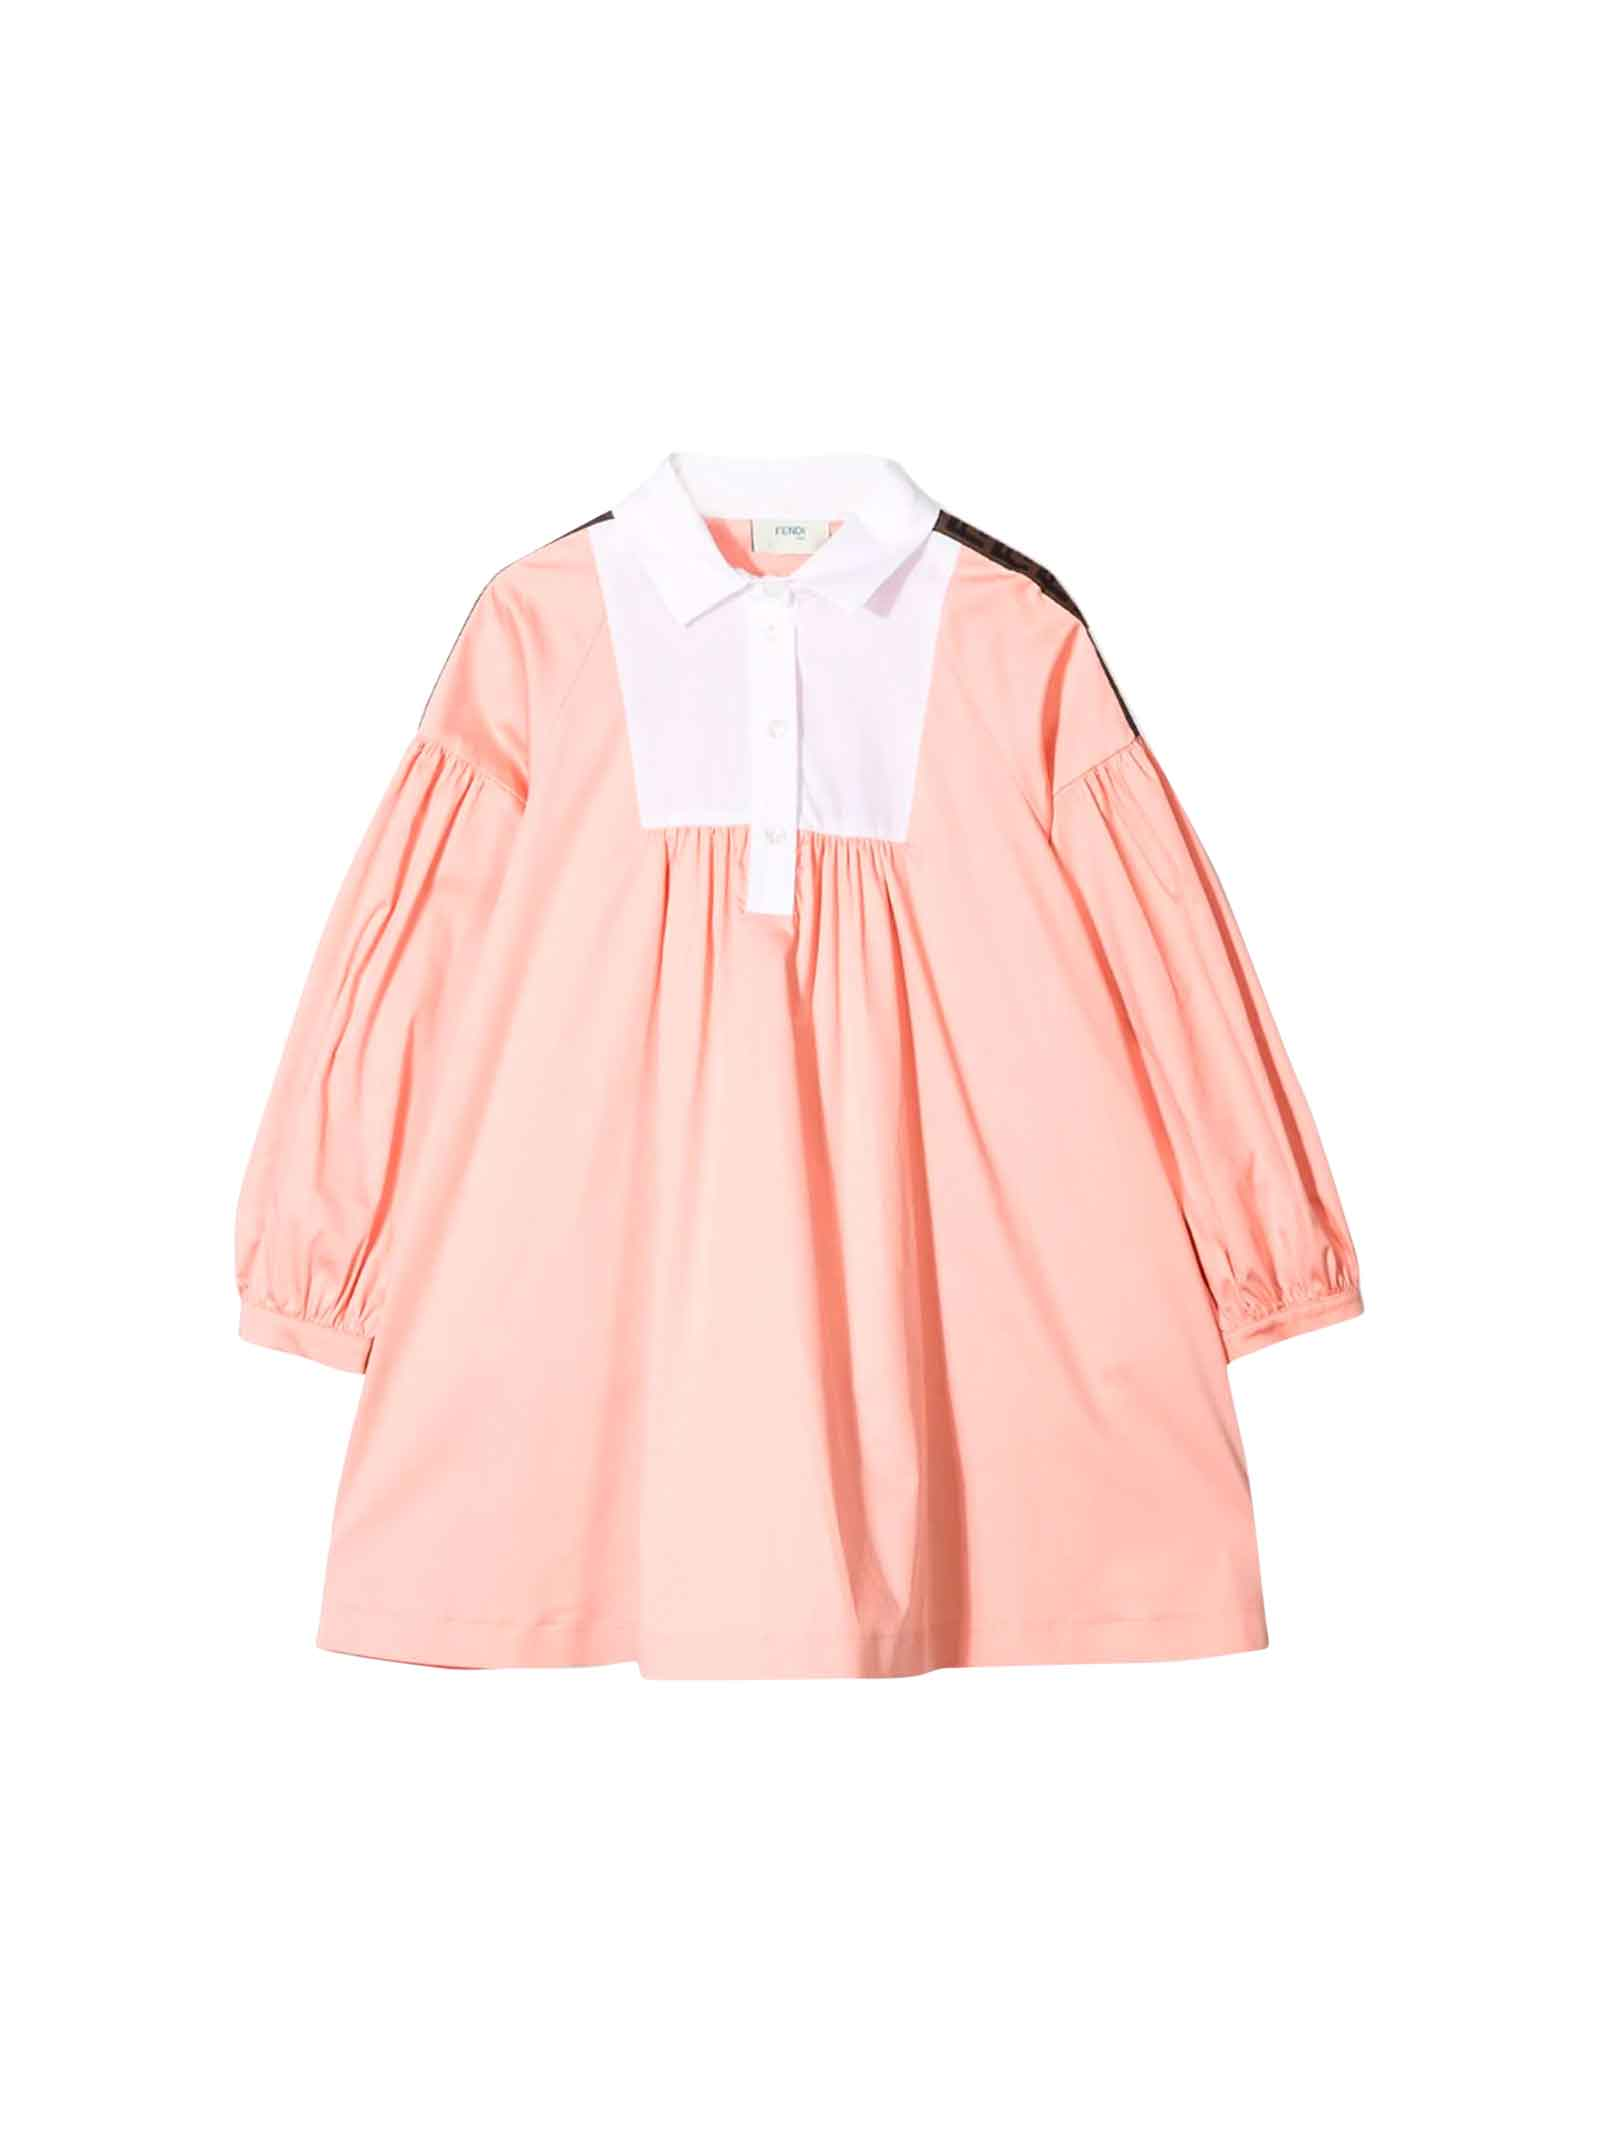 Fendi Pink Peach Dress